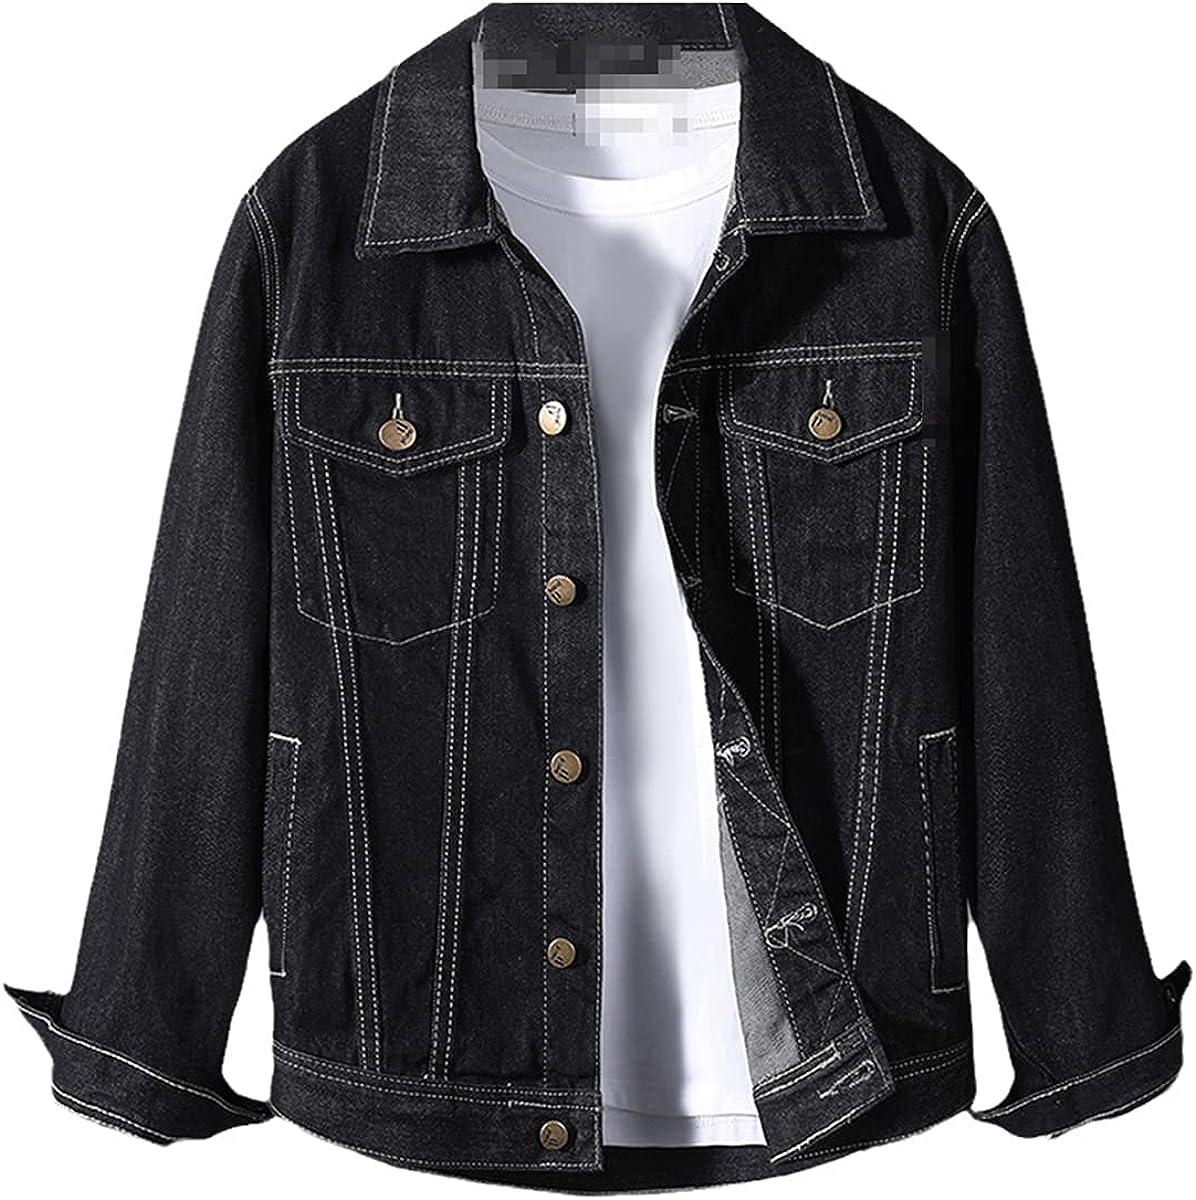 Spring Men's Denim Jacket Male Korean Style Trendy Handsome Outerwear Student Jacket